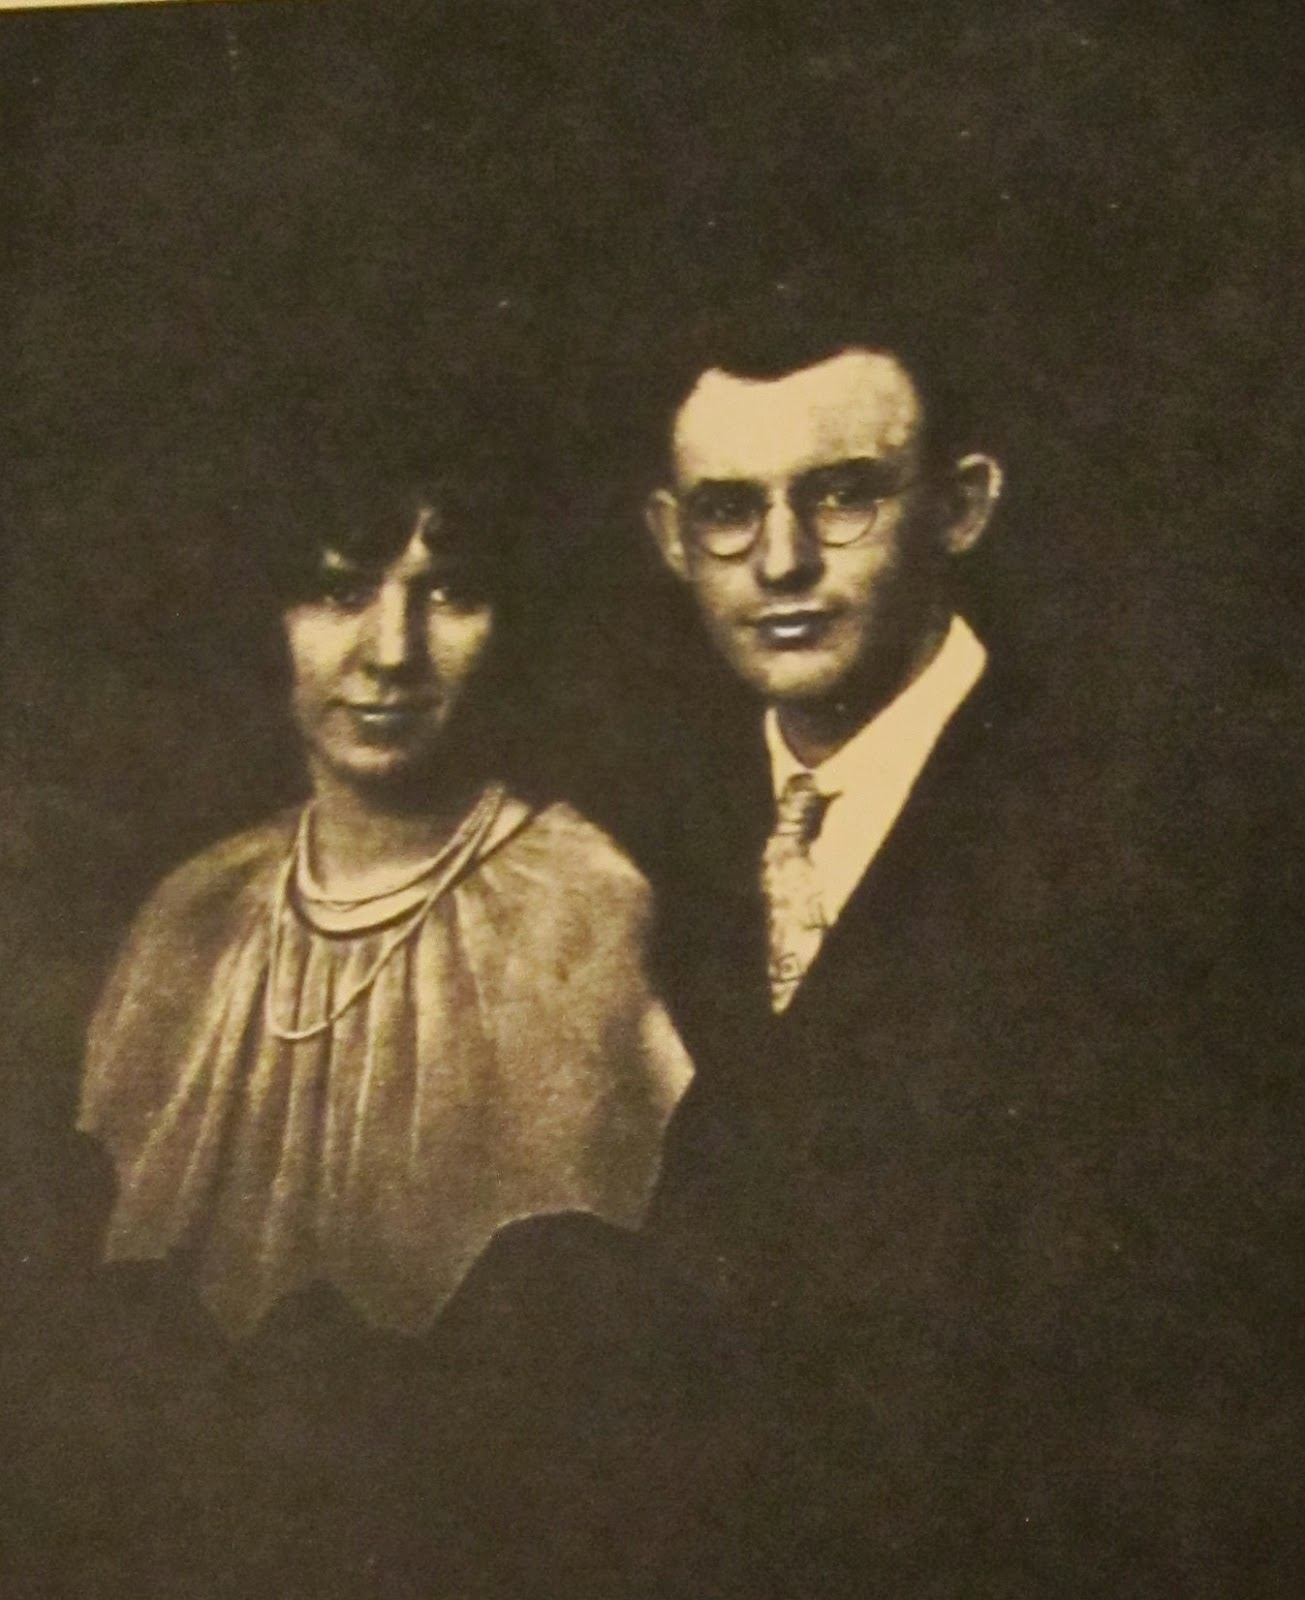 Climbing My Family Tree: Carl and Anna (Bennett) Henn, circa 1929 - wedding picture, I think